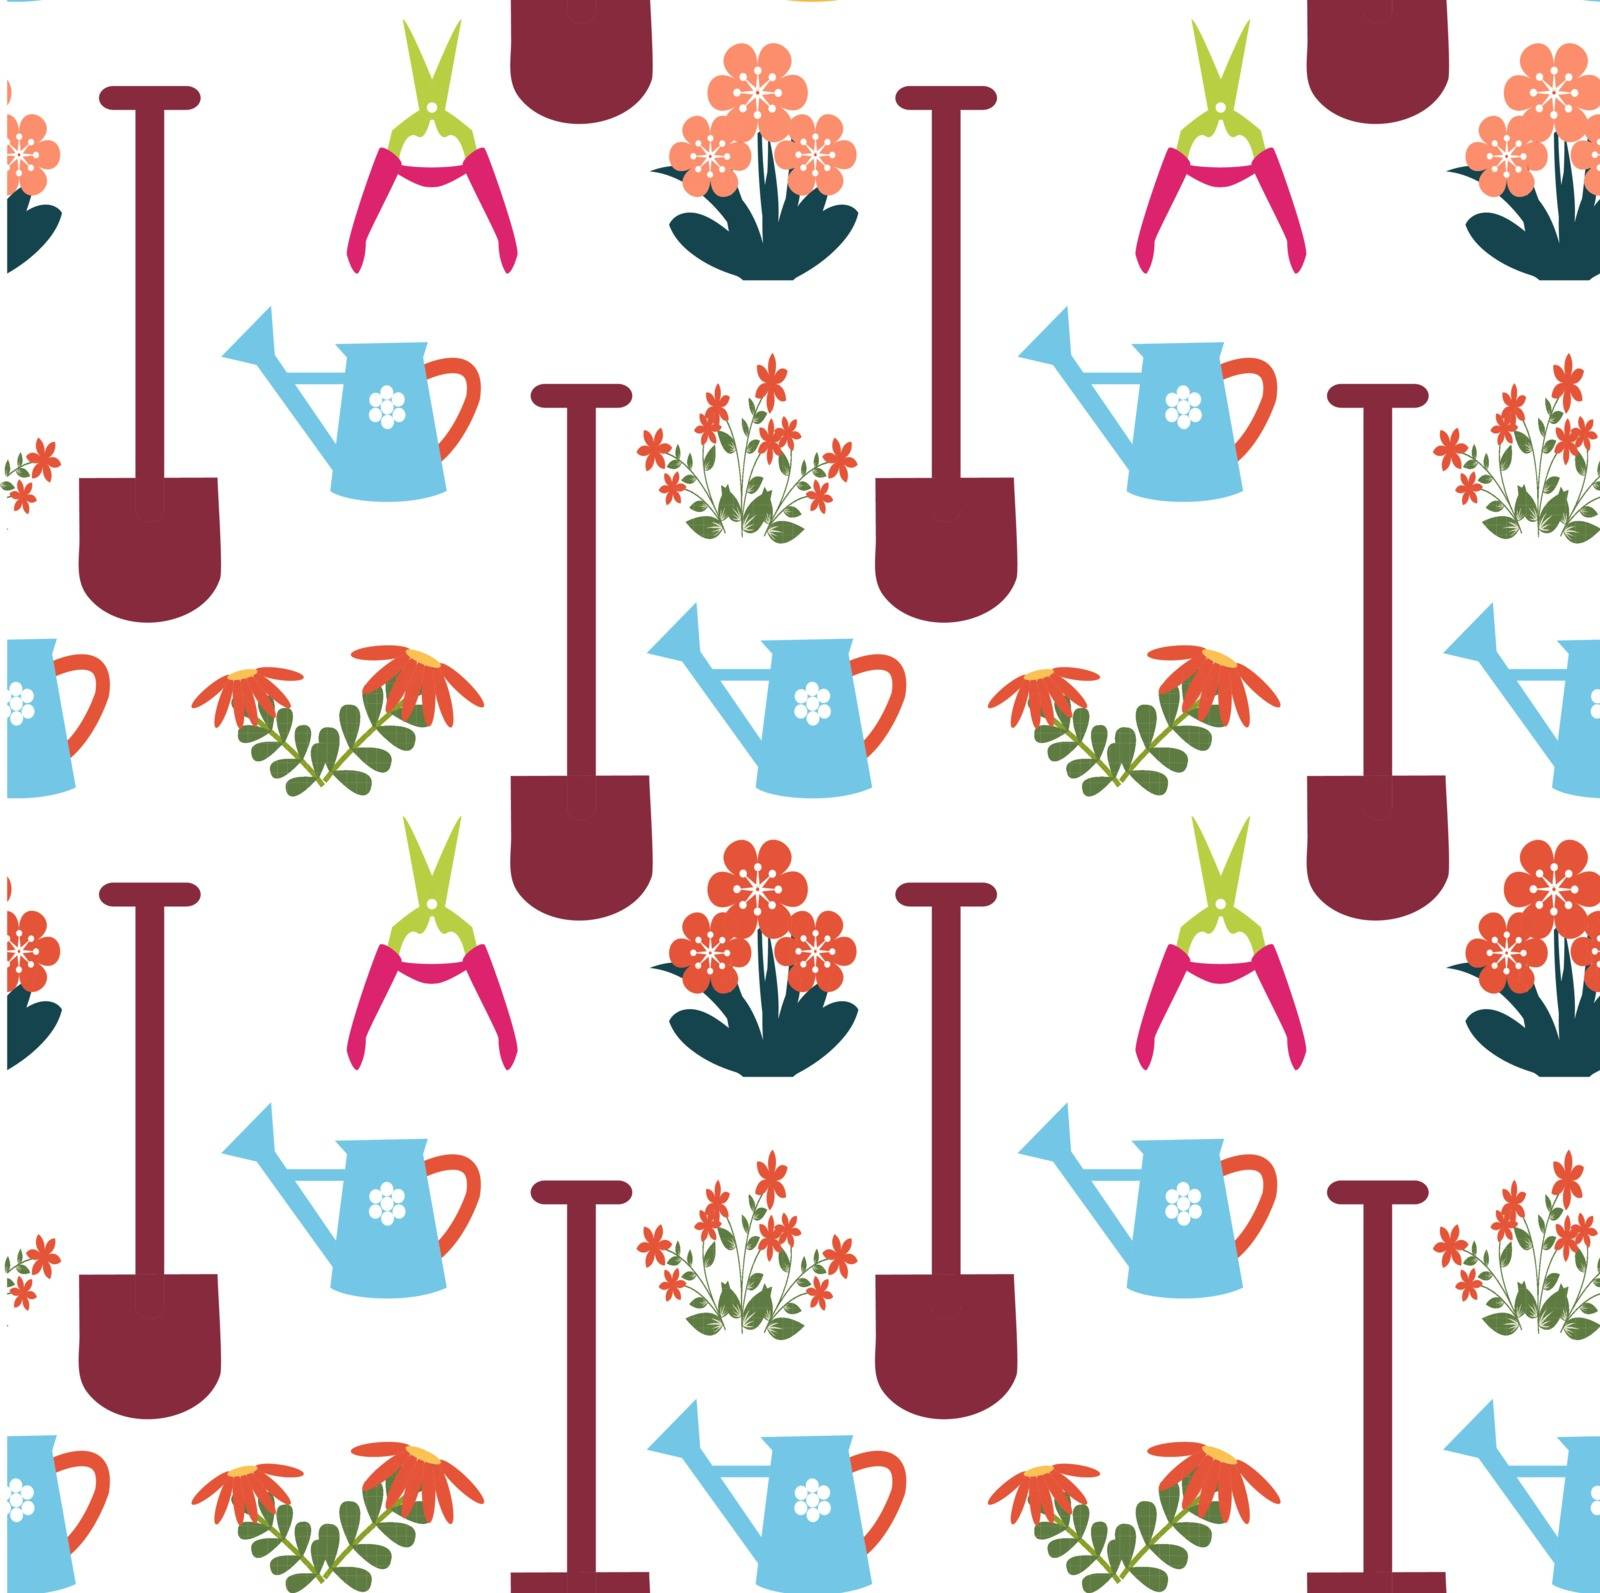 Gardening Repeat seamless Pattern with Gardening Equipment - Illustration